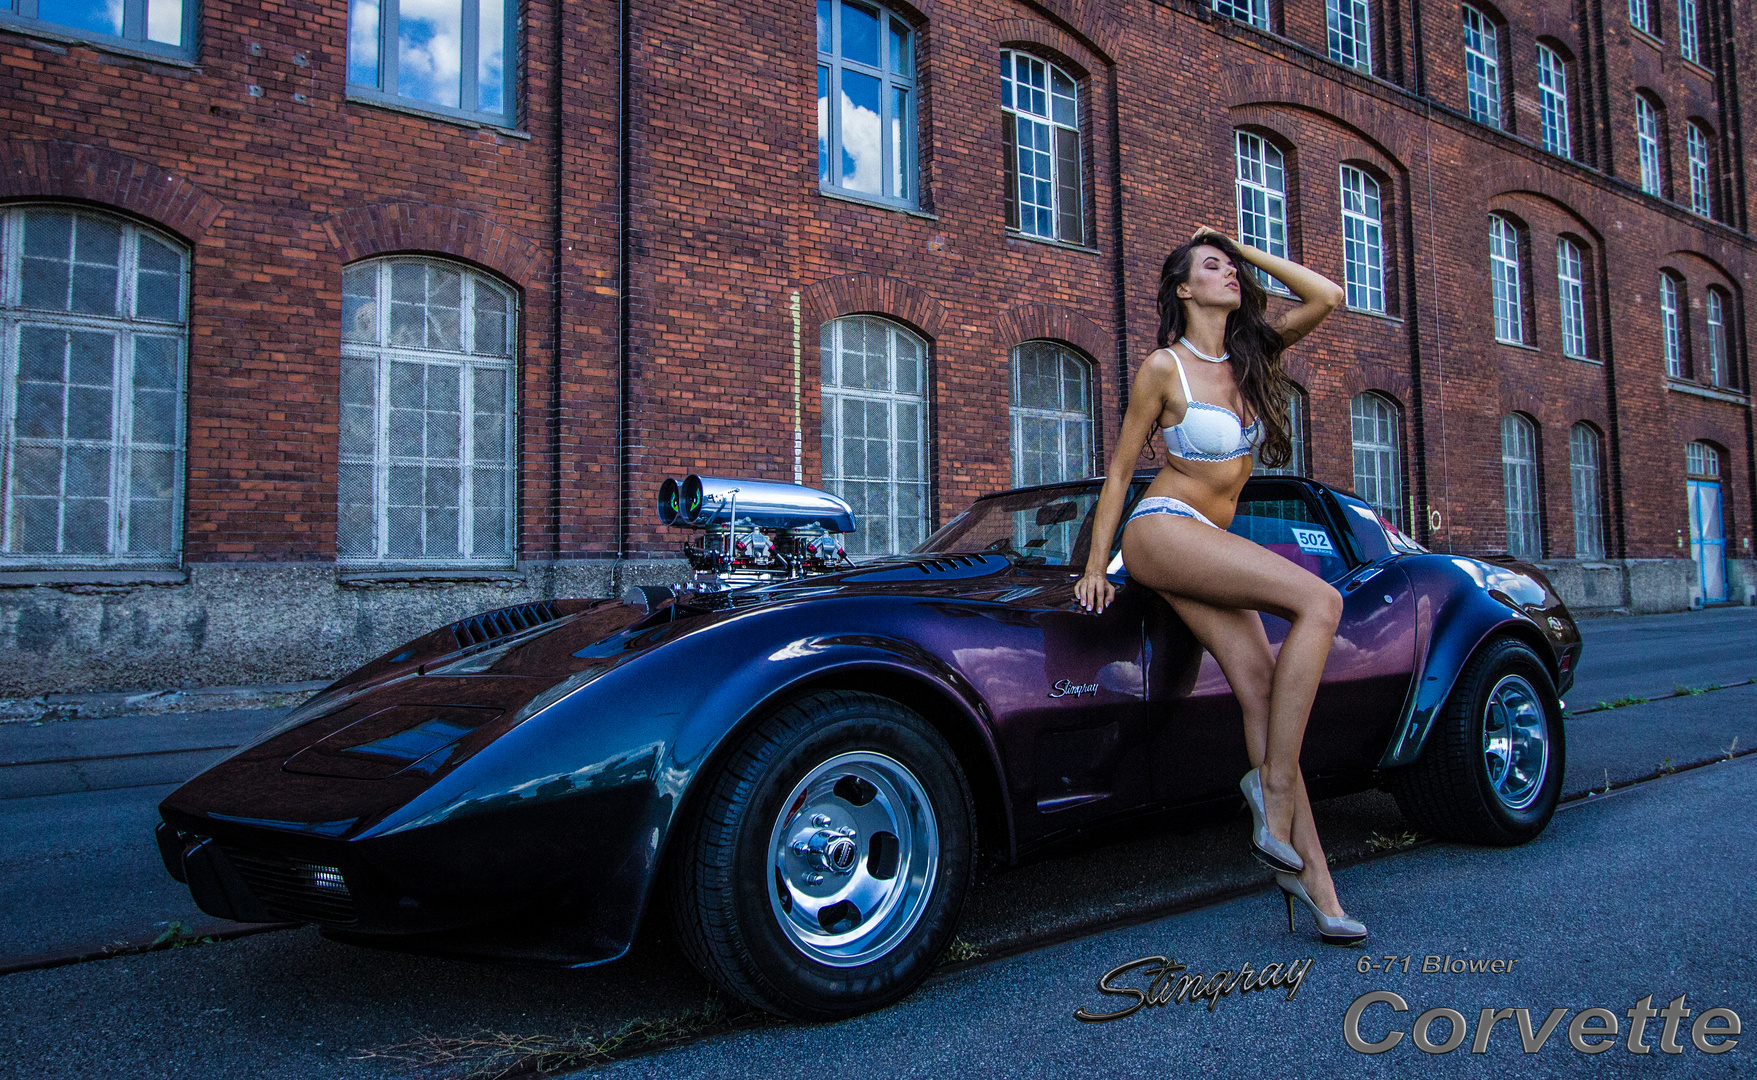 Corvette Shooting